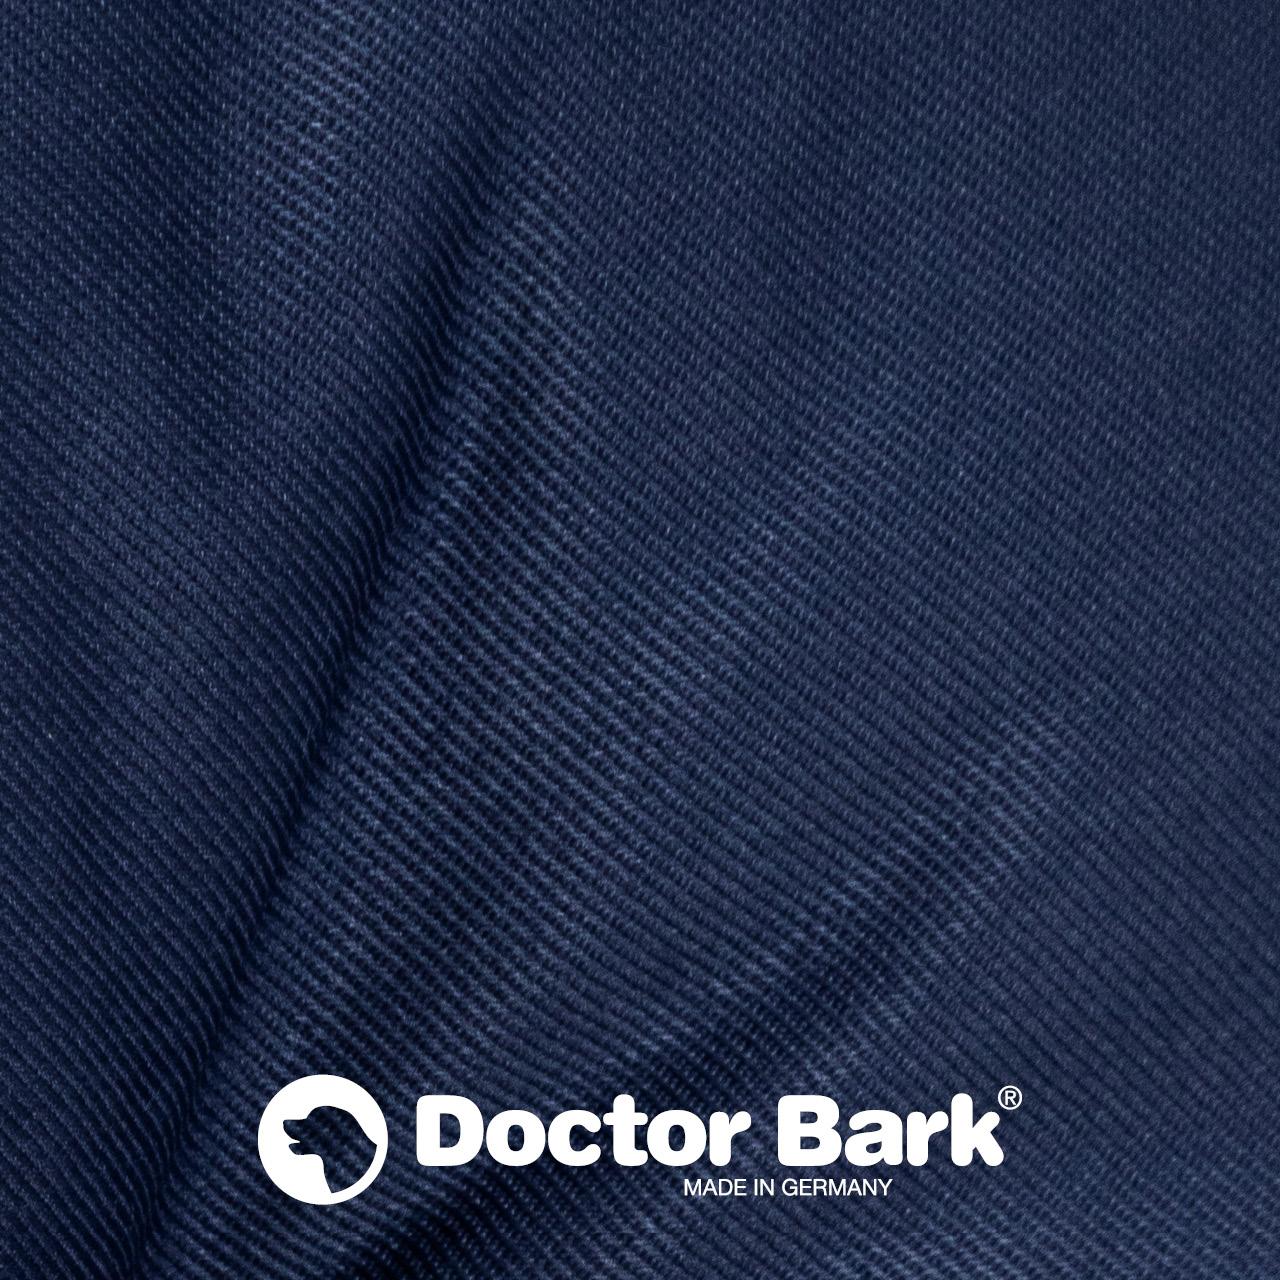 rundes Hundebett mit orthopädischem Wendekissen Doctor Bark Gr. S - königsblau blau